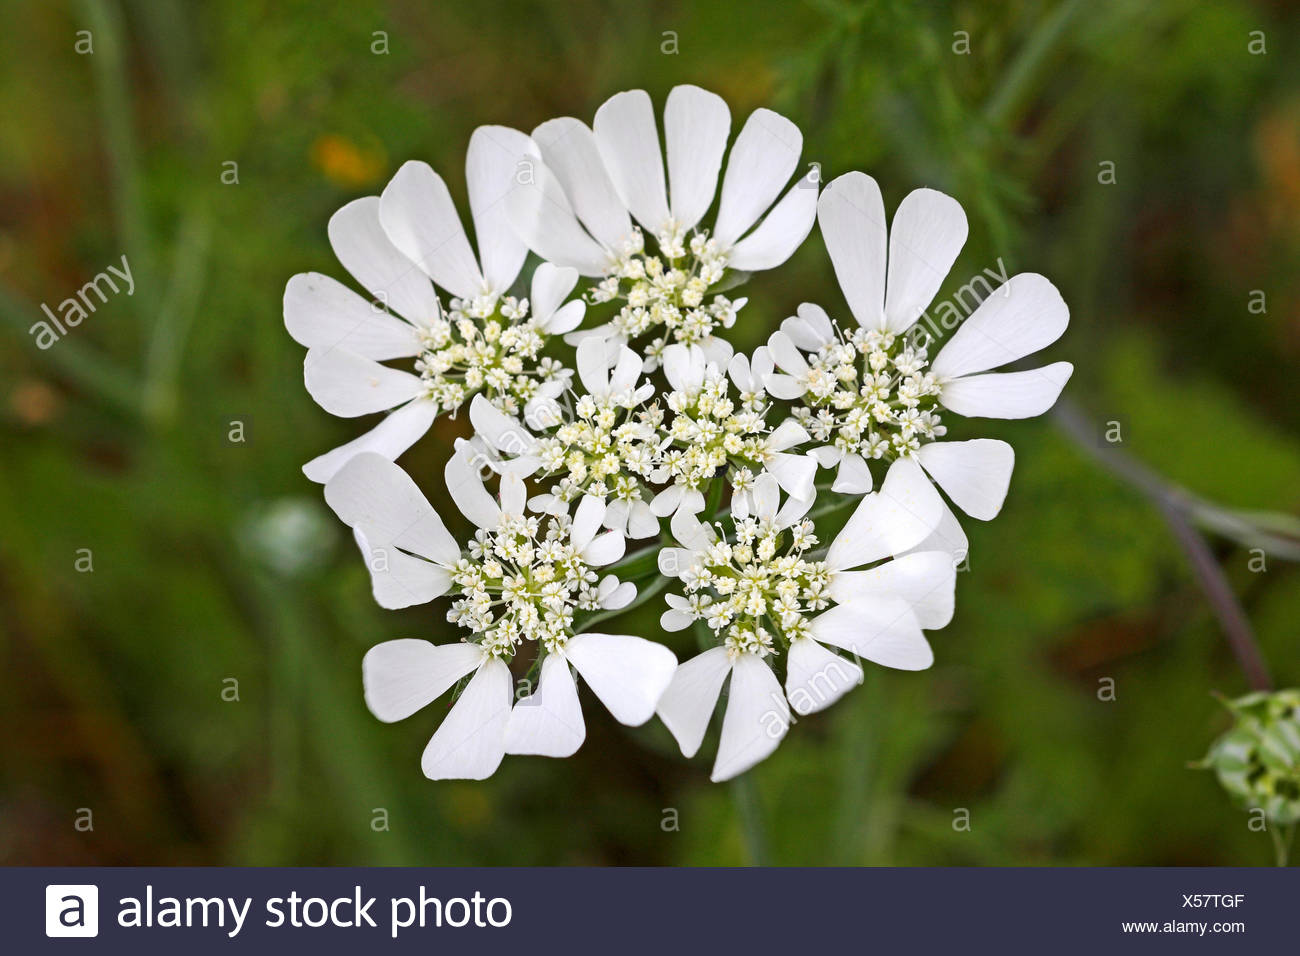 White lace flower, White laceflower, Minoan Lace (Orlaya grandiflora, Caucalis grandiflora), umbel, Germany Stock Photo